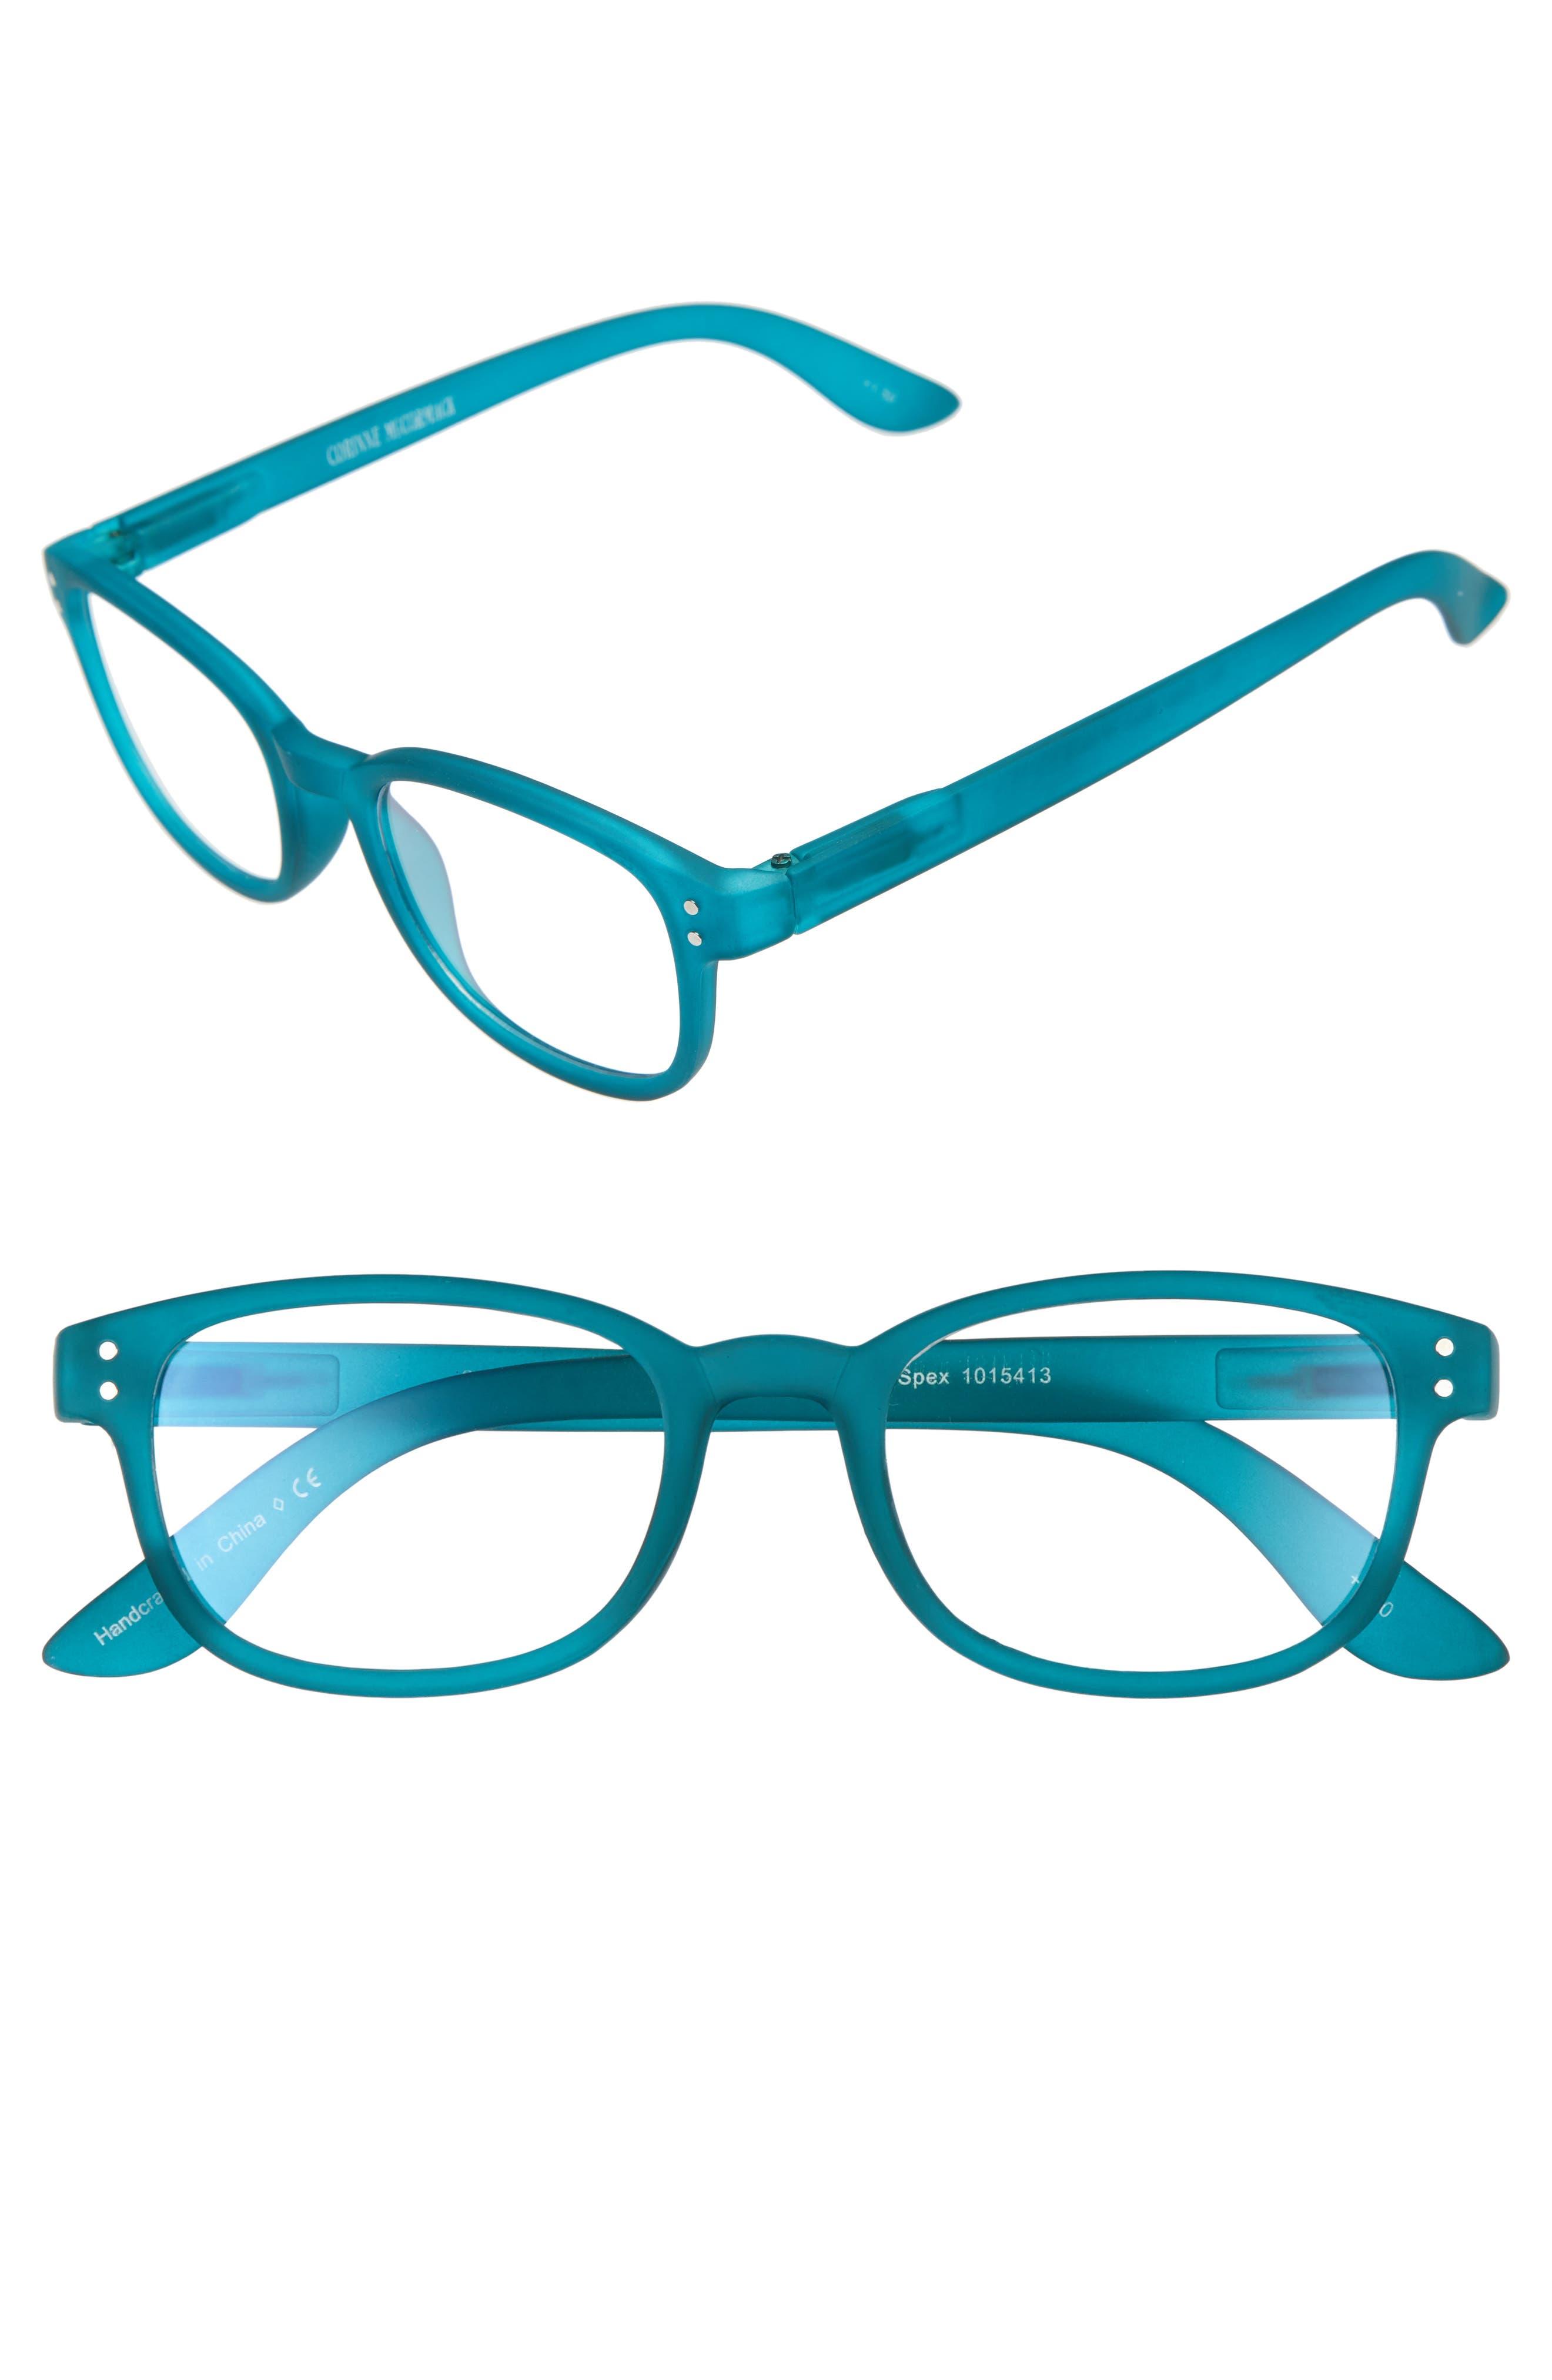 Colorspex 50mm Blue Light Blocking Reading Glasses